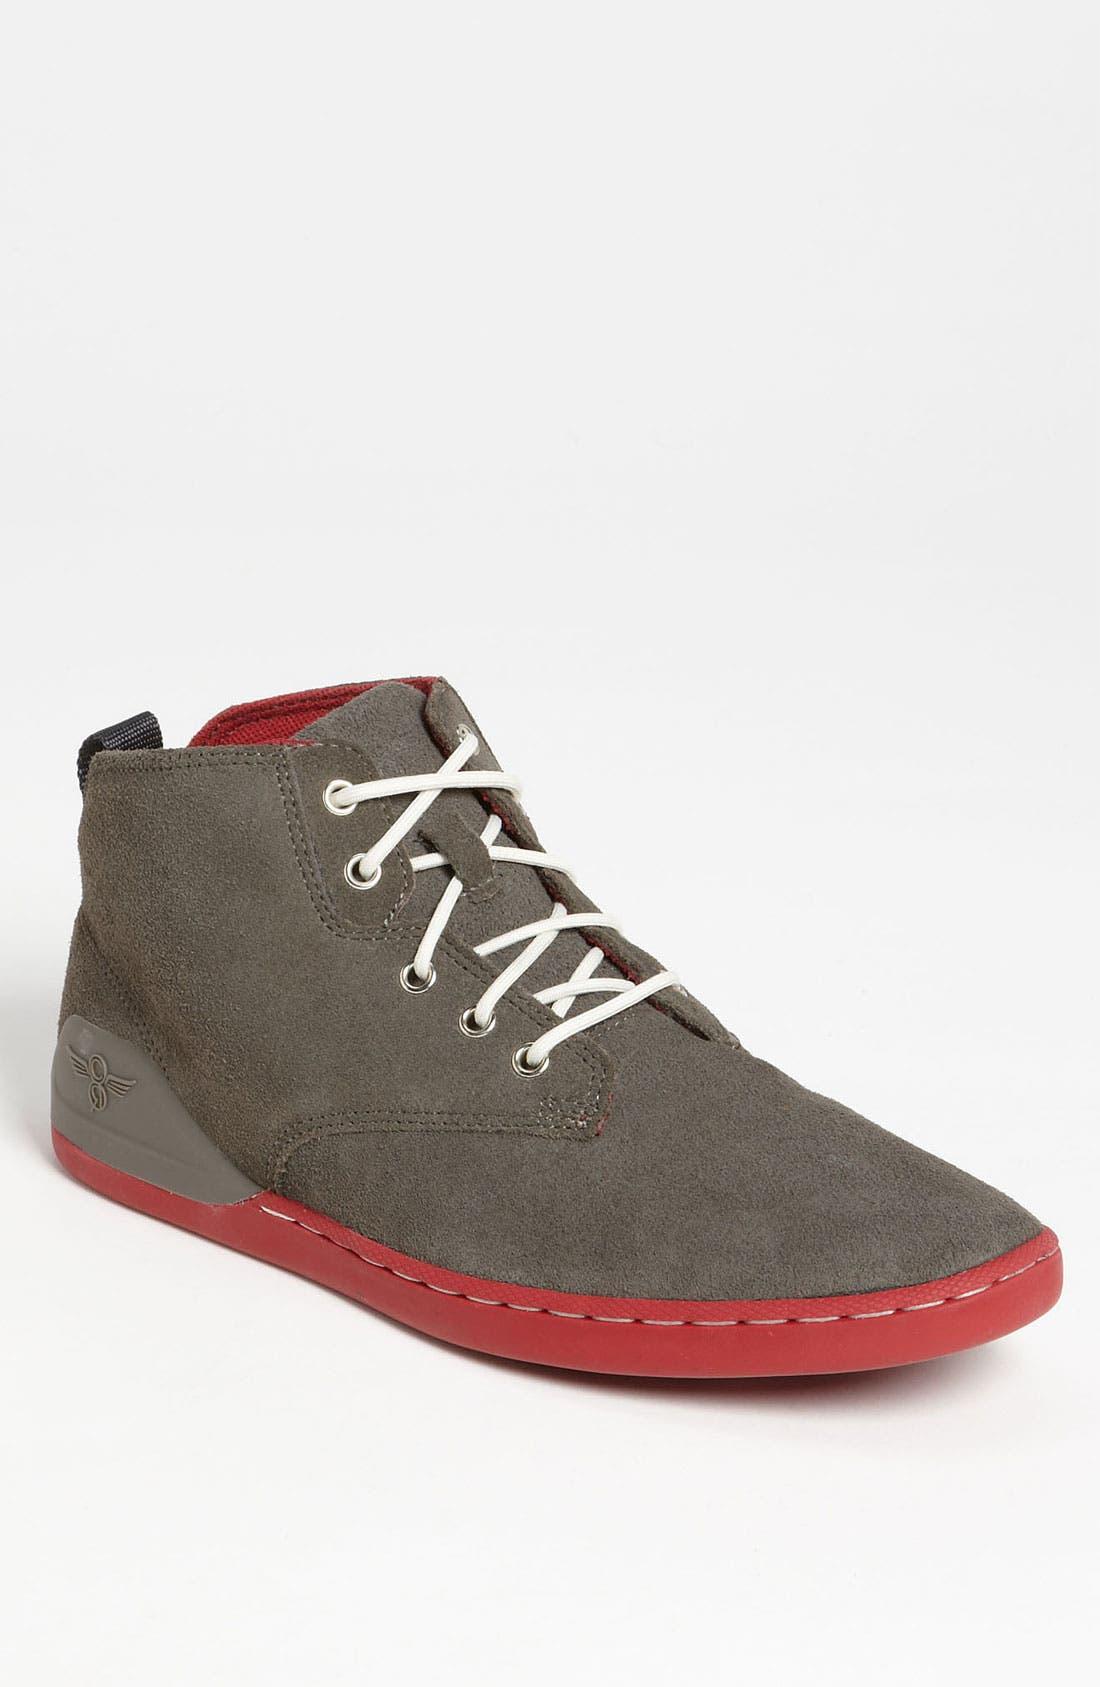 Main Image - Creative Recreation 'Vito' Sneaker (Men)